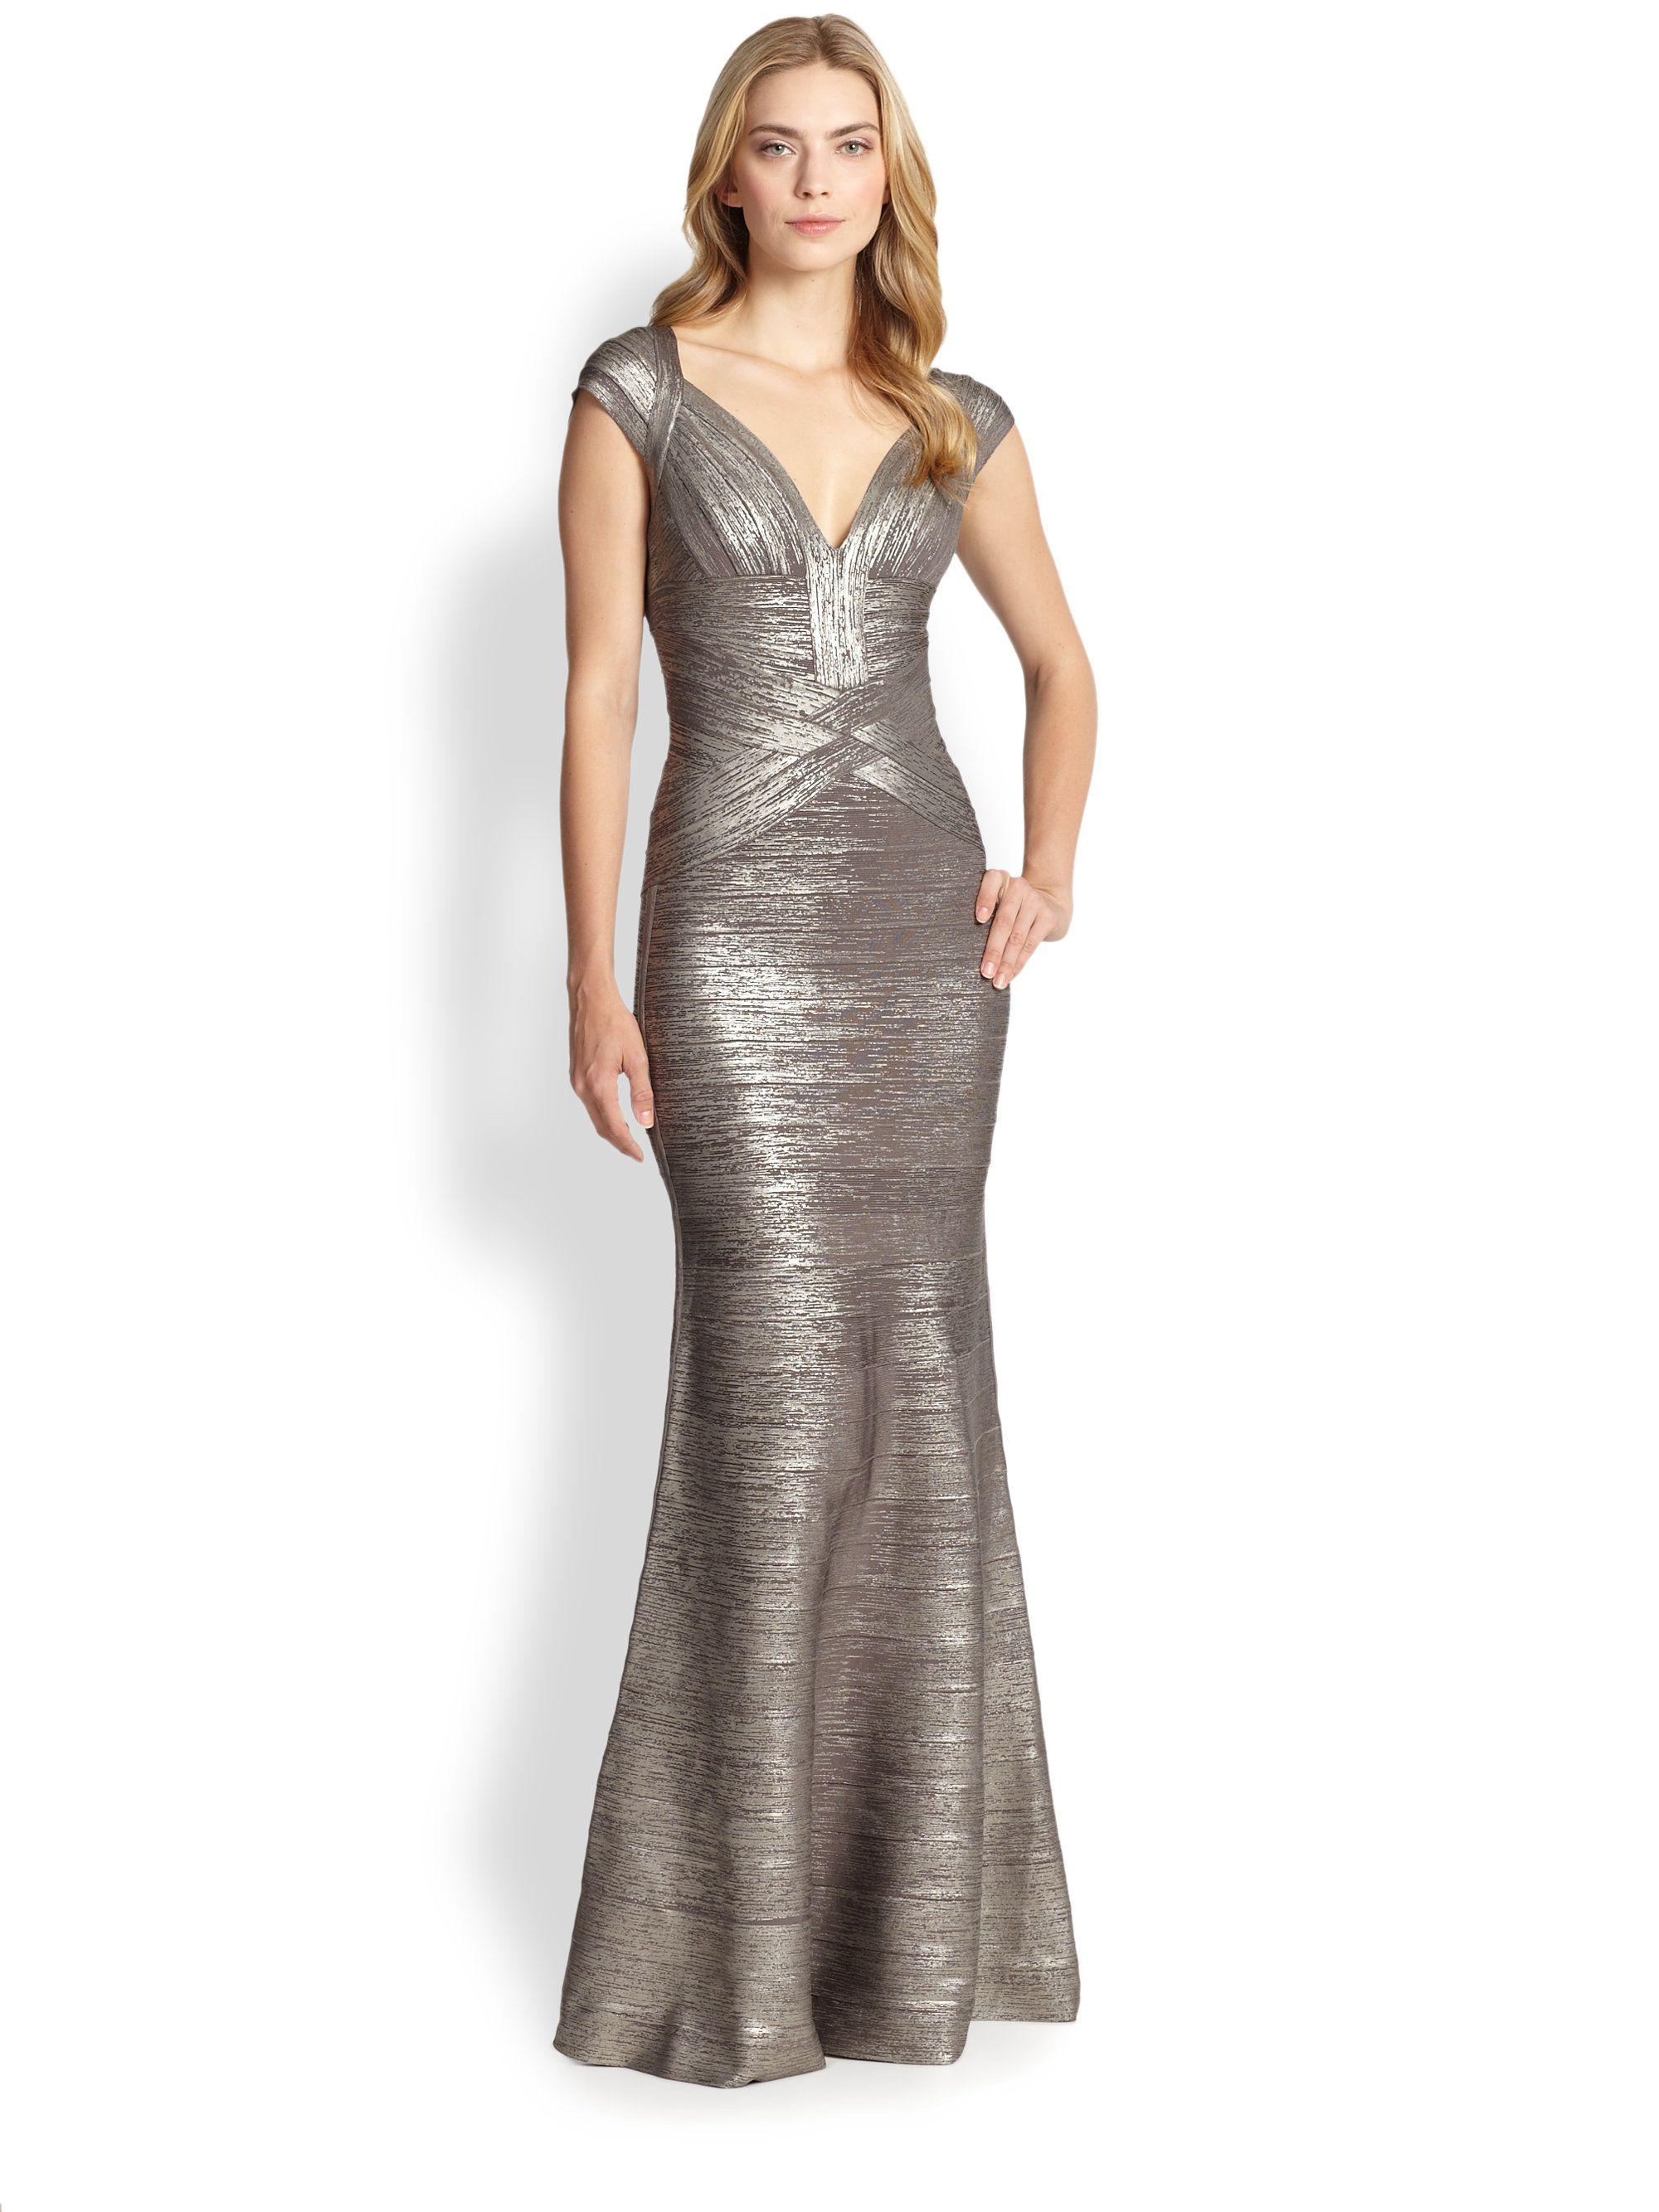 Bridesmaids Mermaid Gown Dresses Silver Dress V Neck